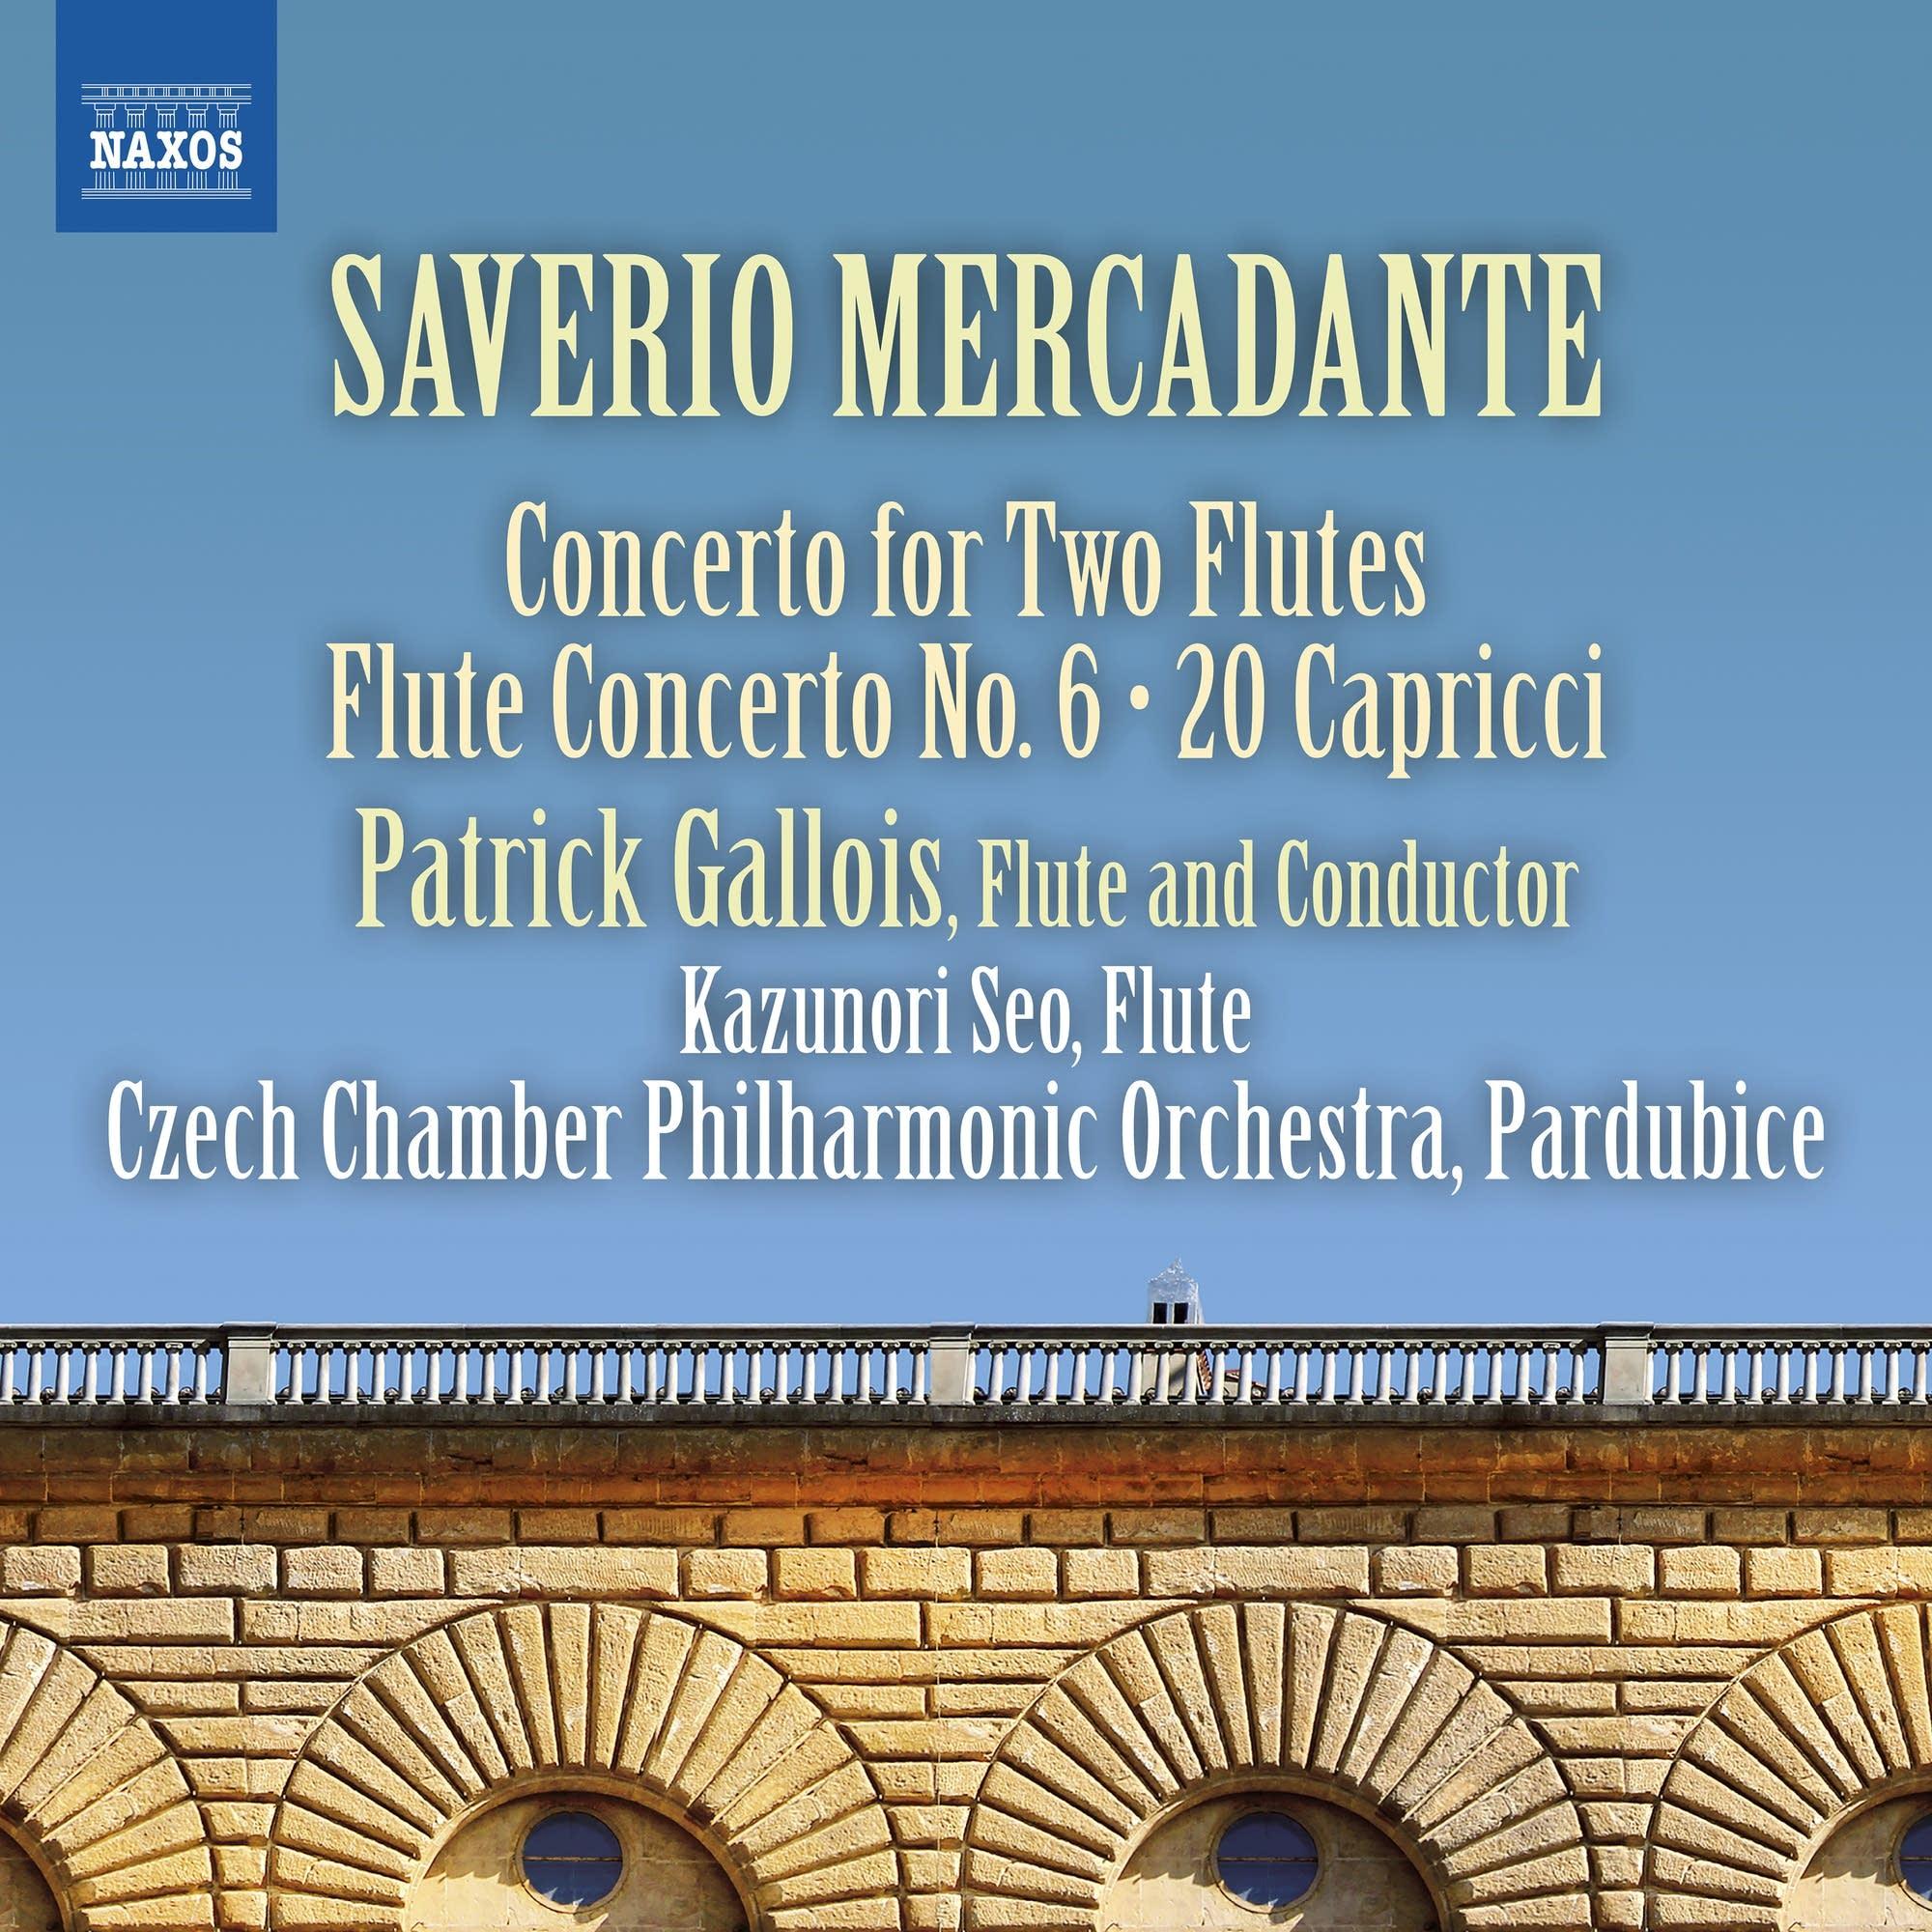 Saverio Mercadante - Flute Concerto No. 6: III. Polacca